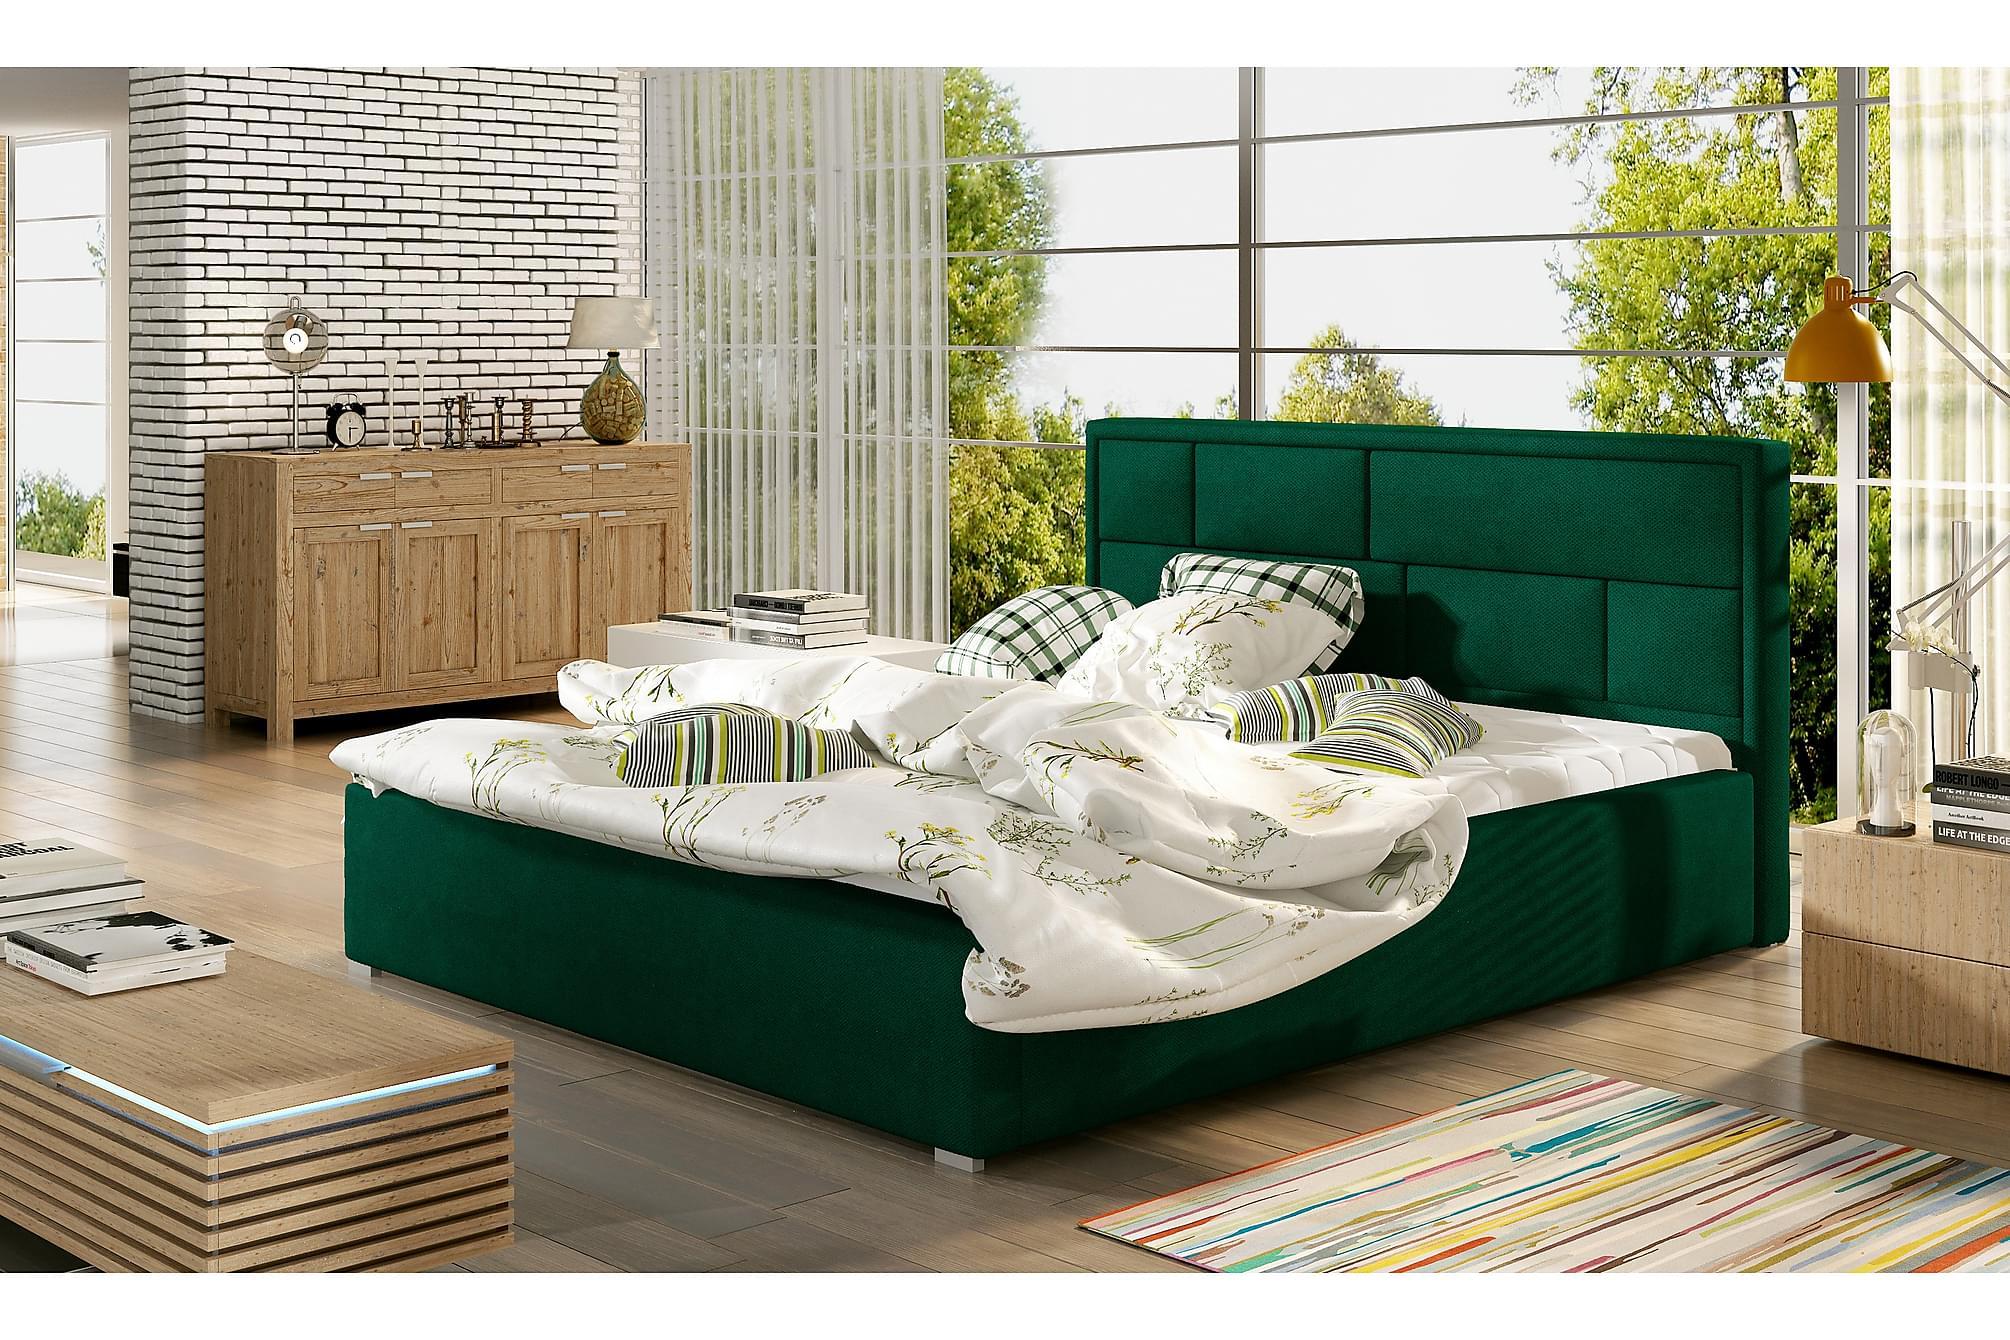 AGULLANA Sängram 180x200 cm Grön, Sängram & sängstomme